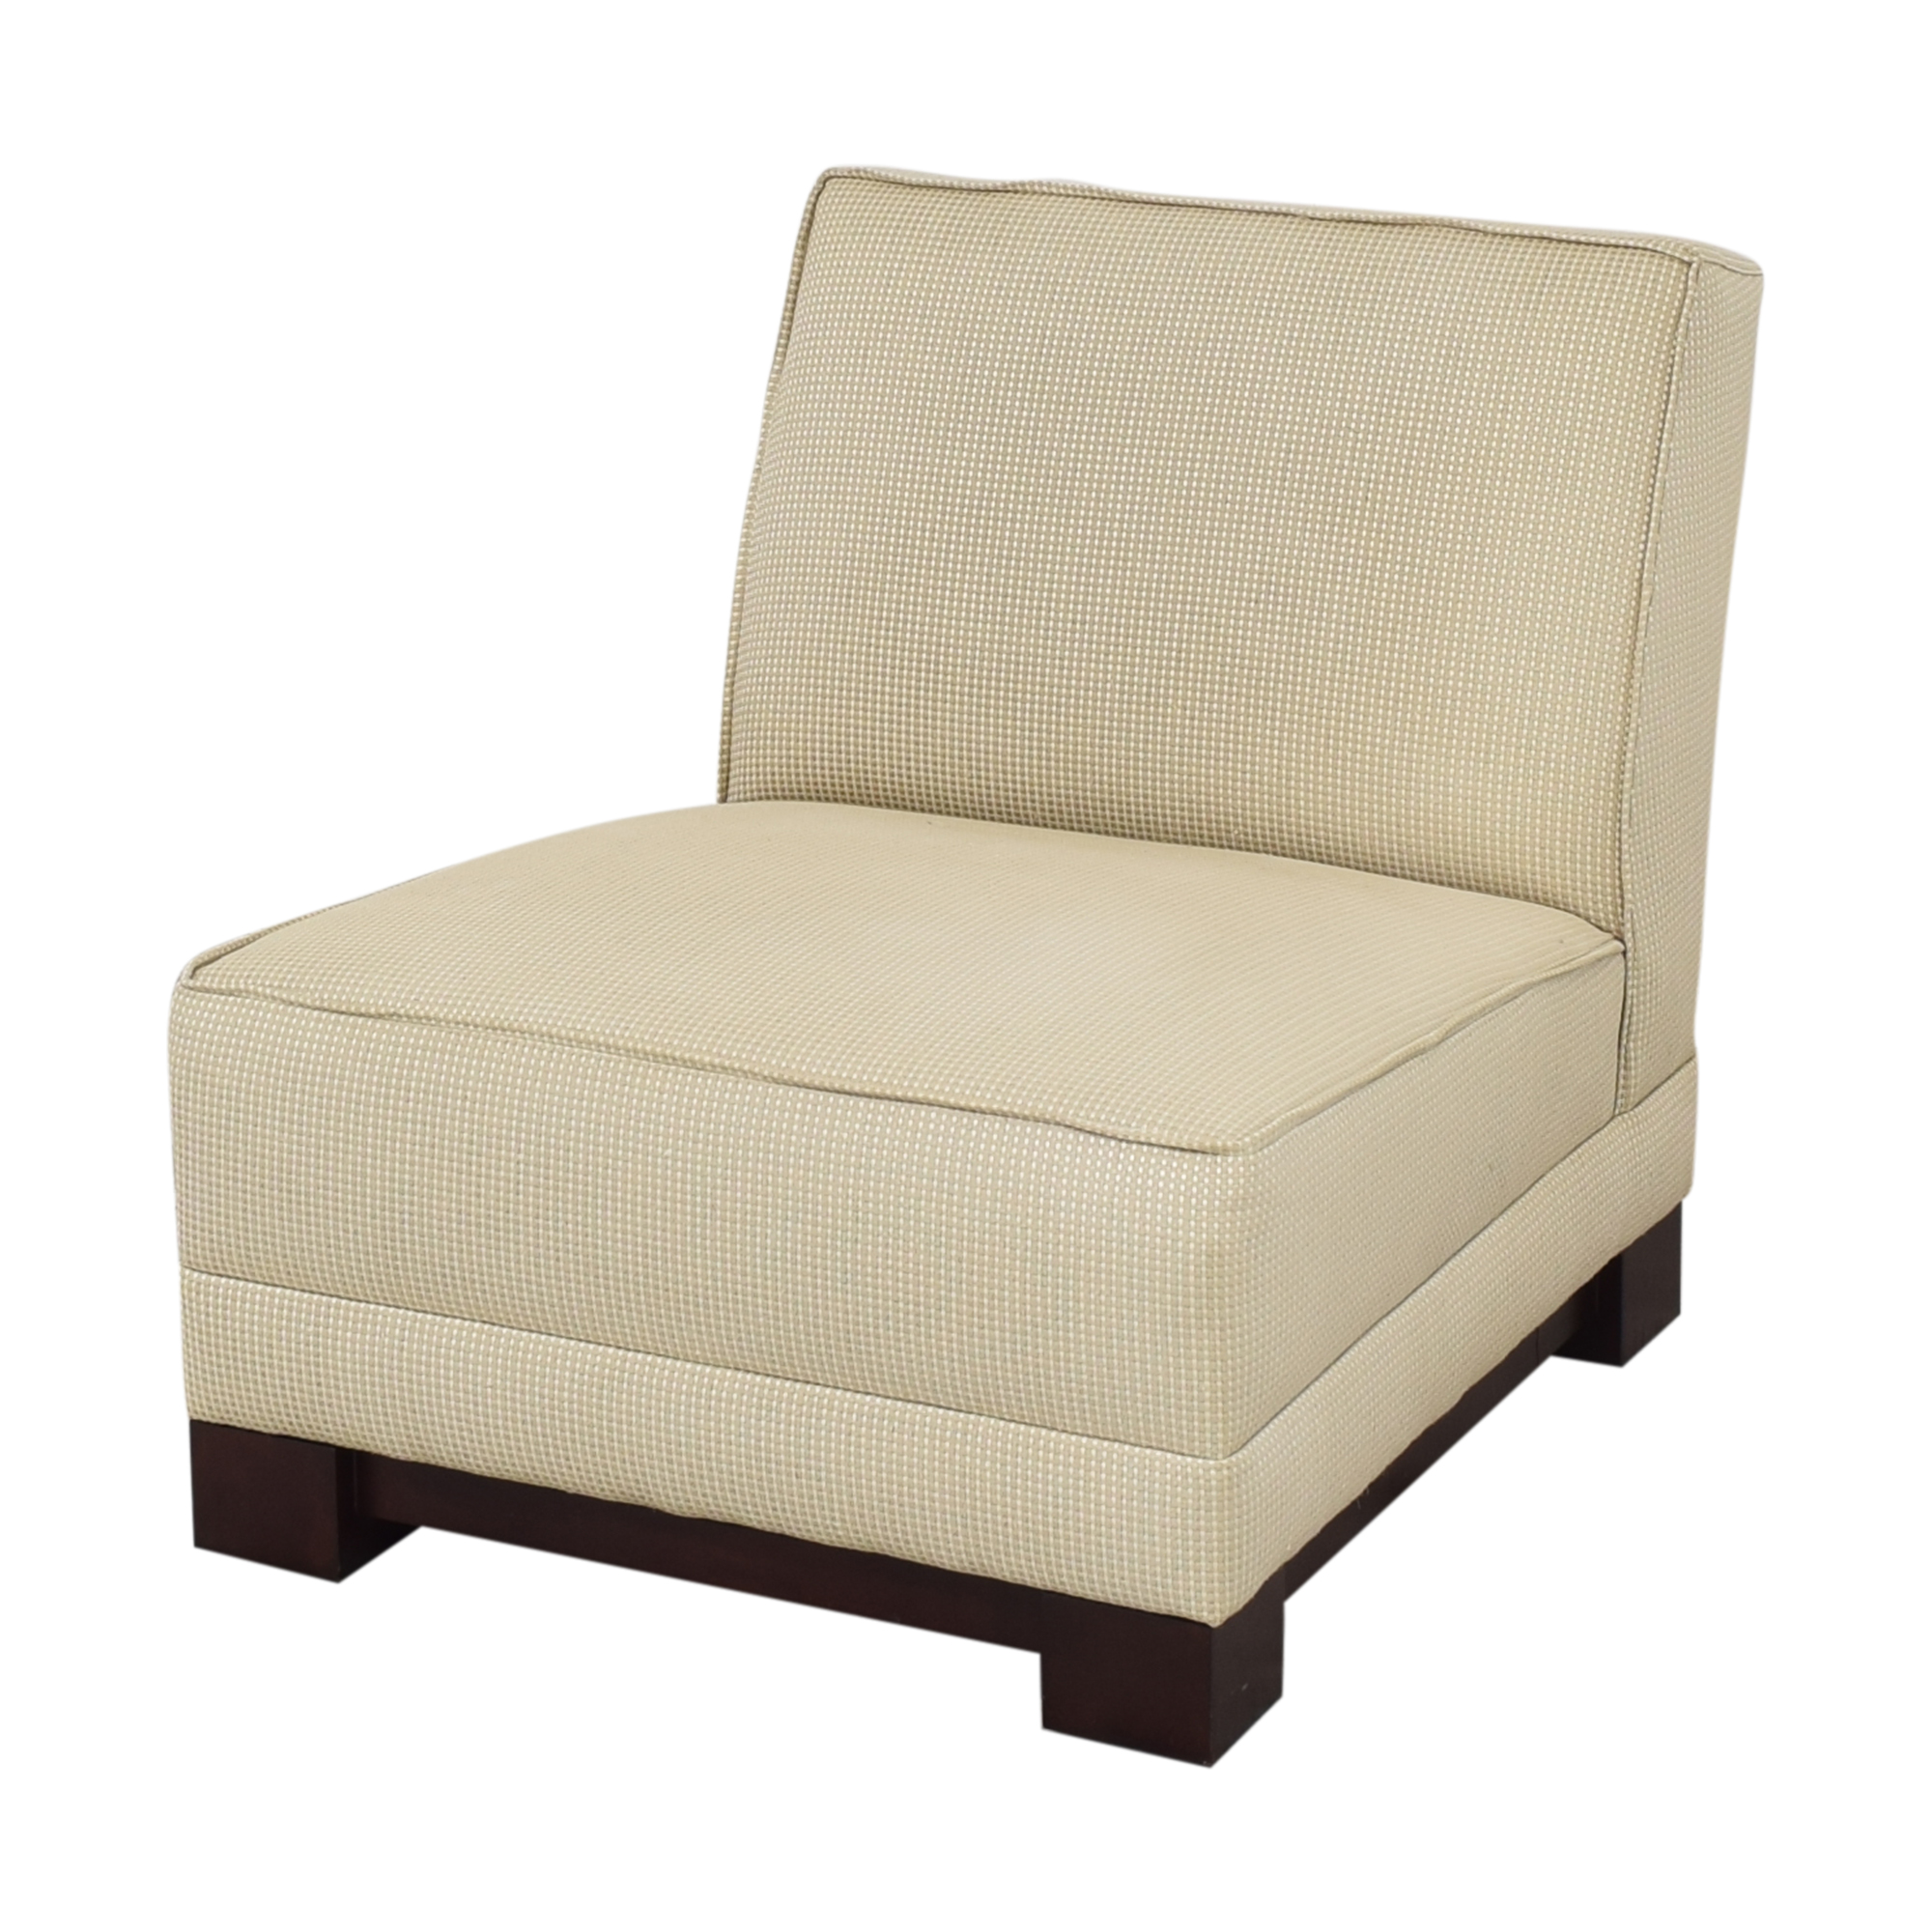 shop Ralph Lauren Home Hasley Slipper Chair with Ottoman Ralph Lauren Home Accent Chairs